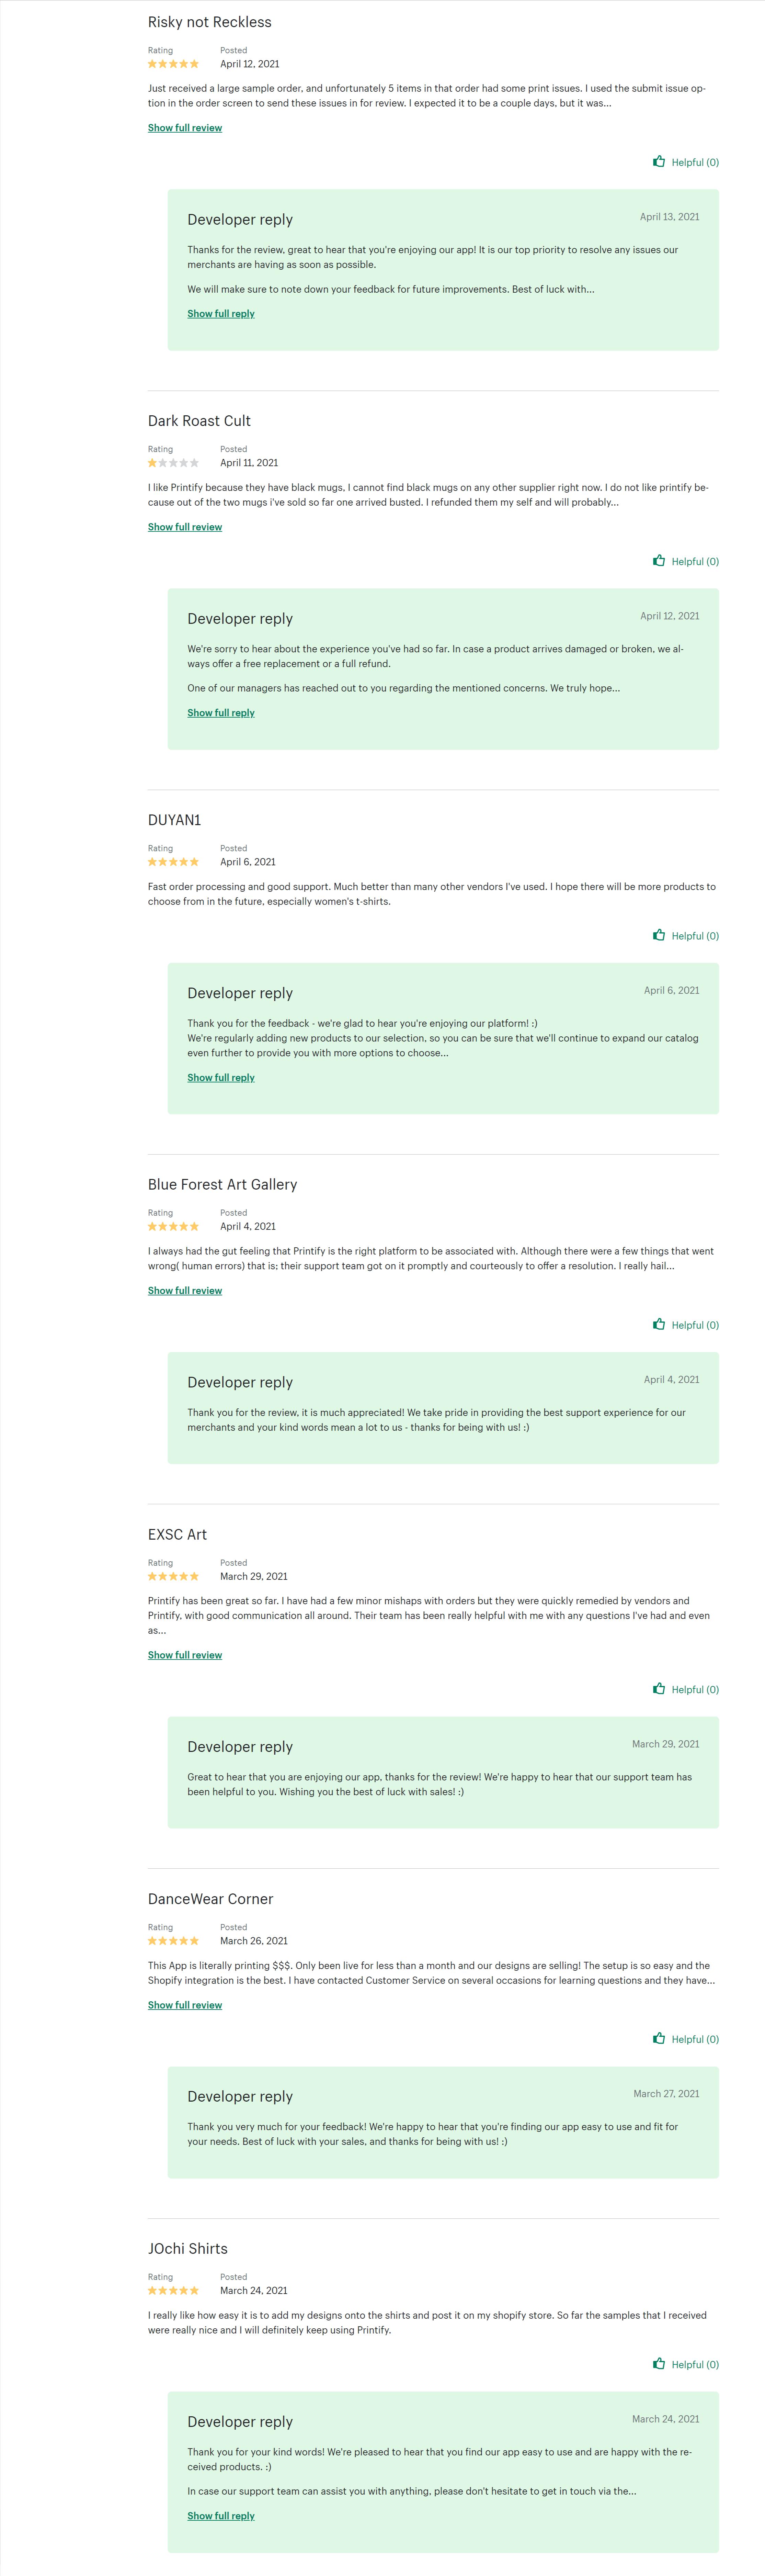 Printify Print on Demand App Reviews